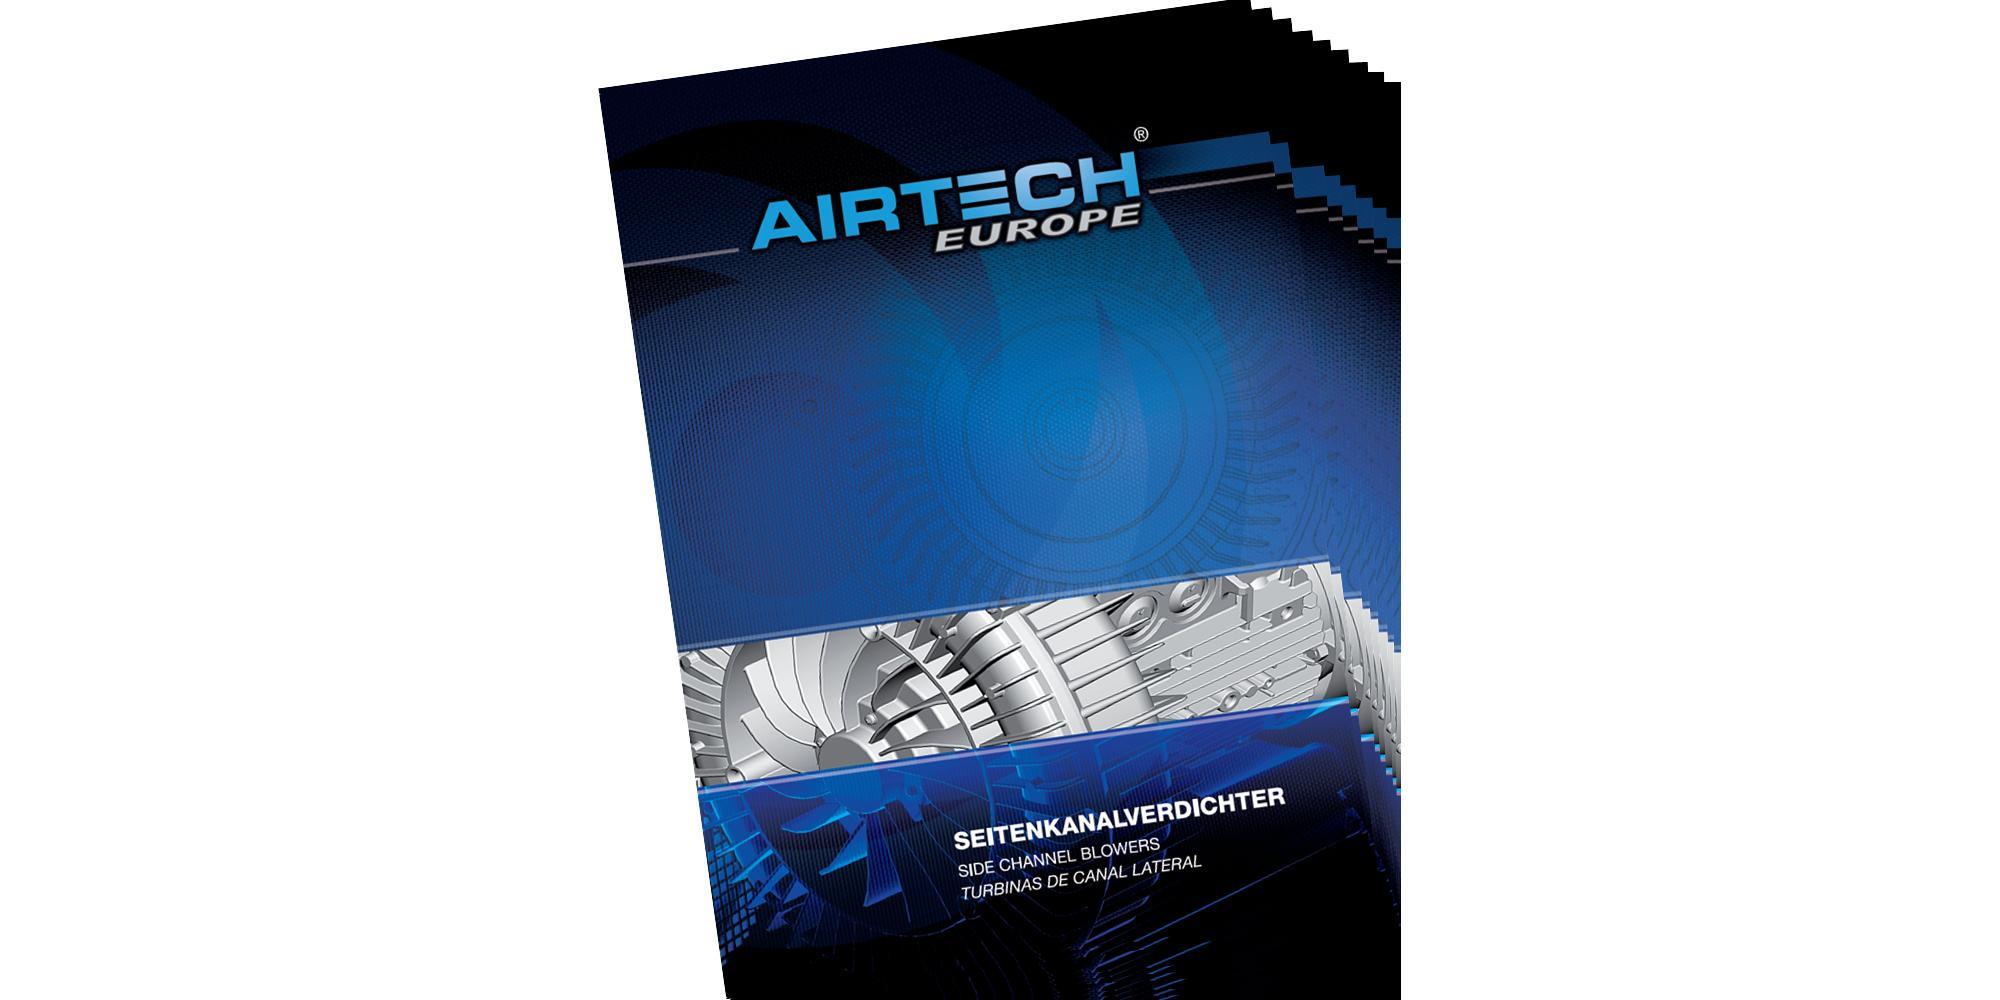 c5c7b5e61edf56 Catalogues - AIRTECH Europe